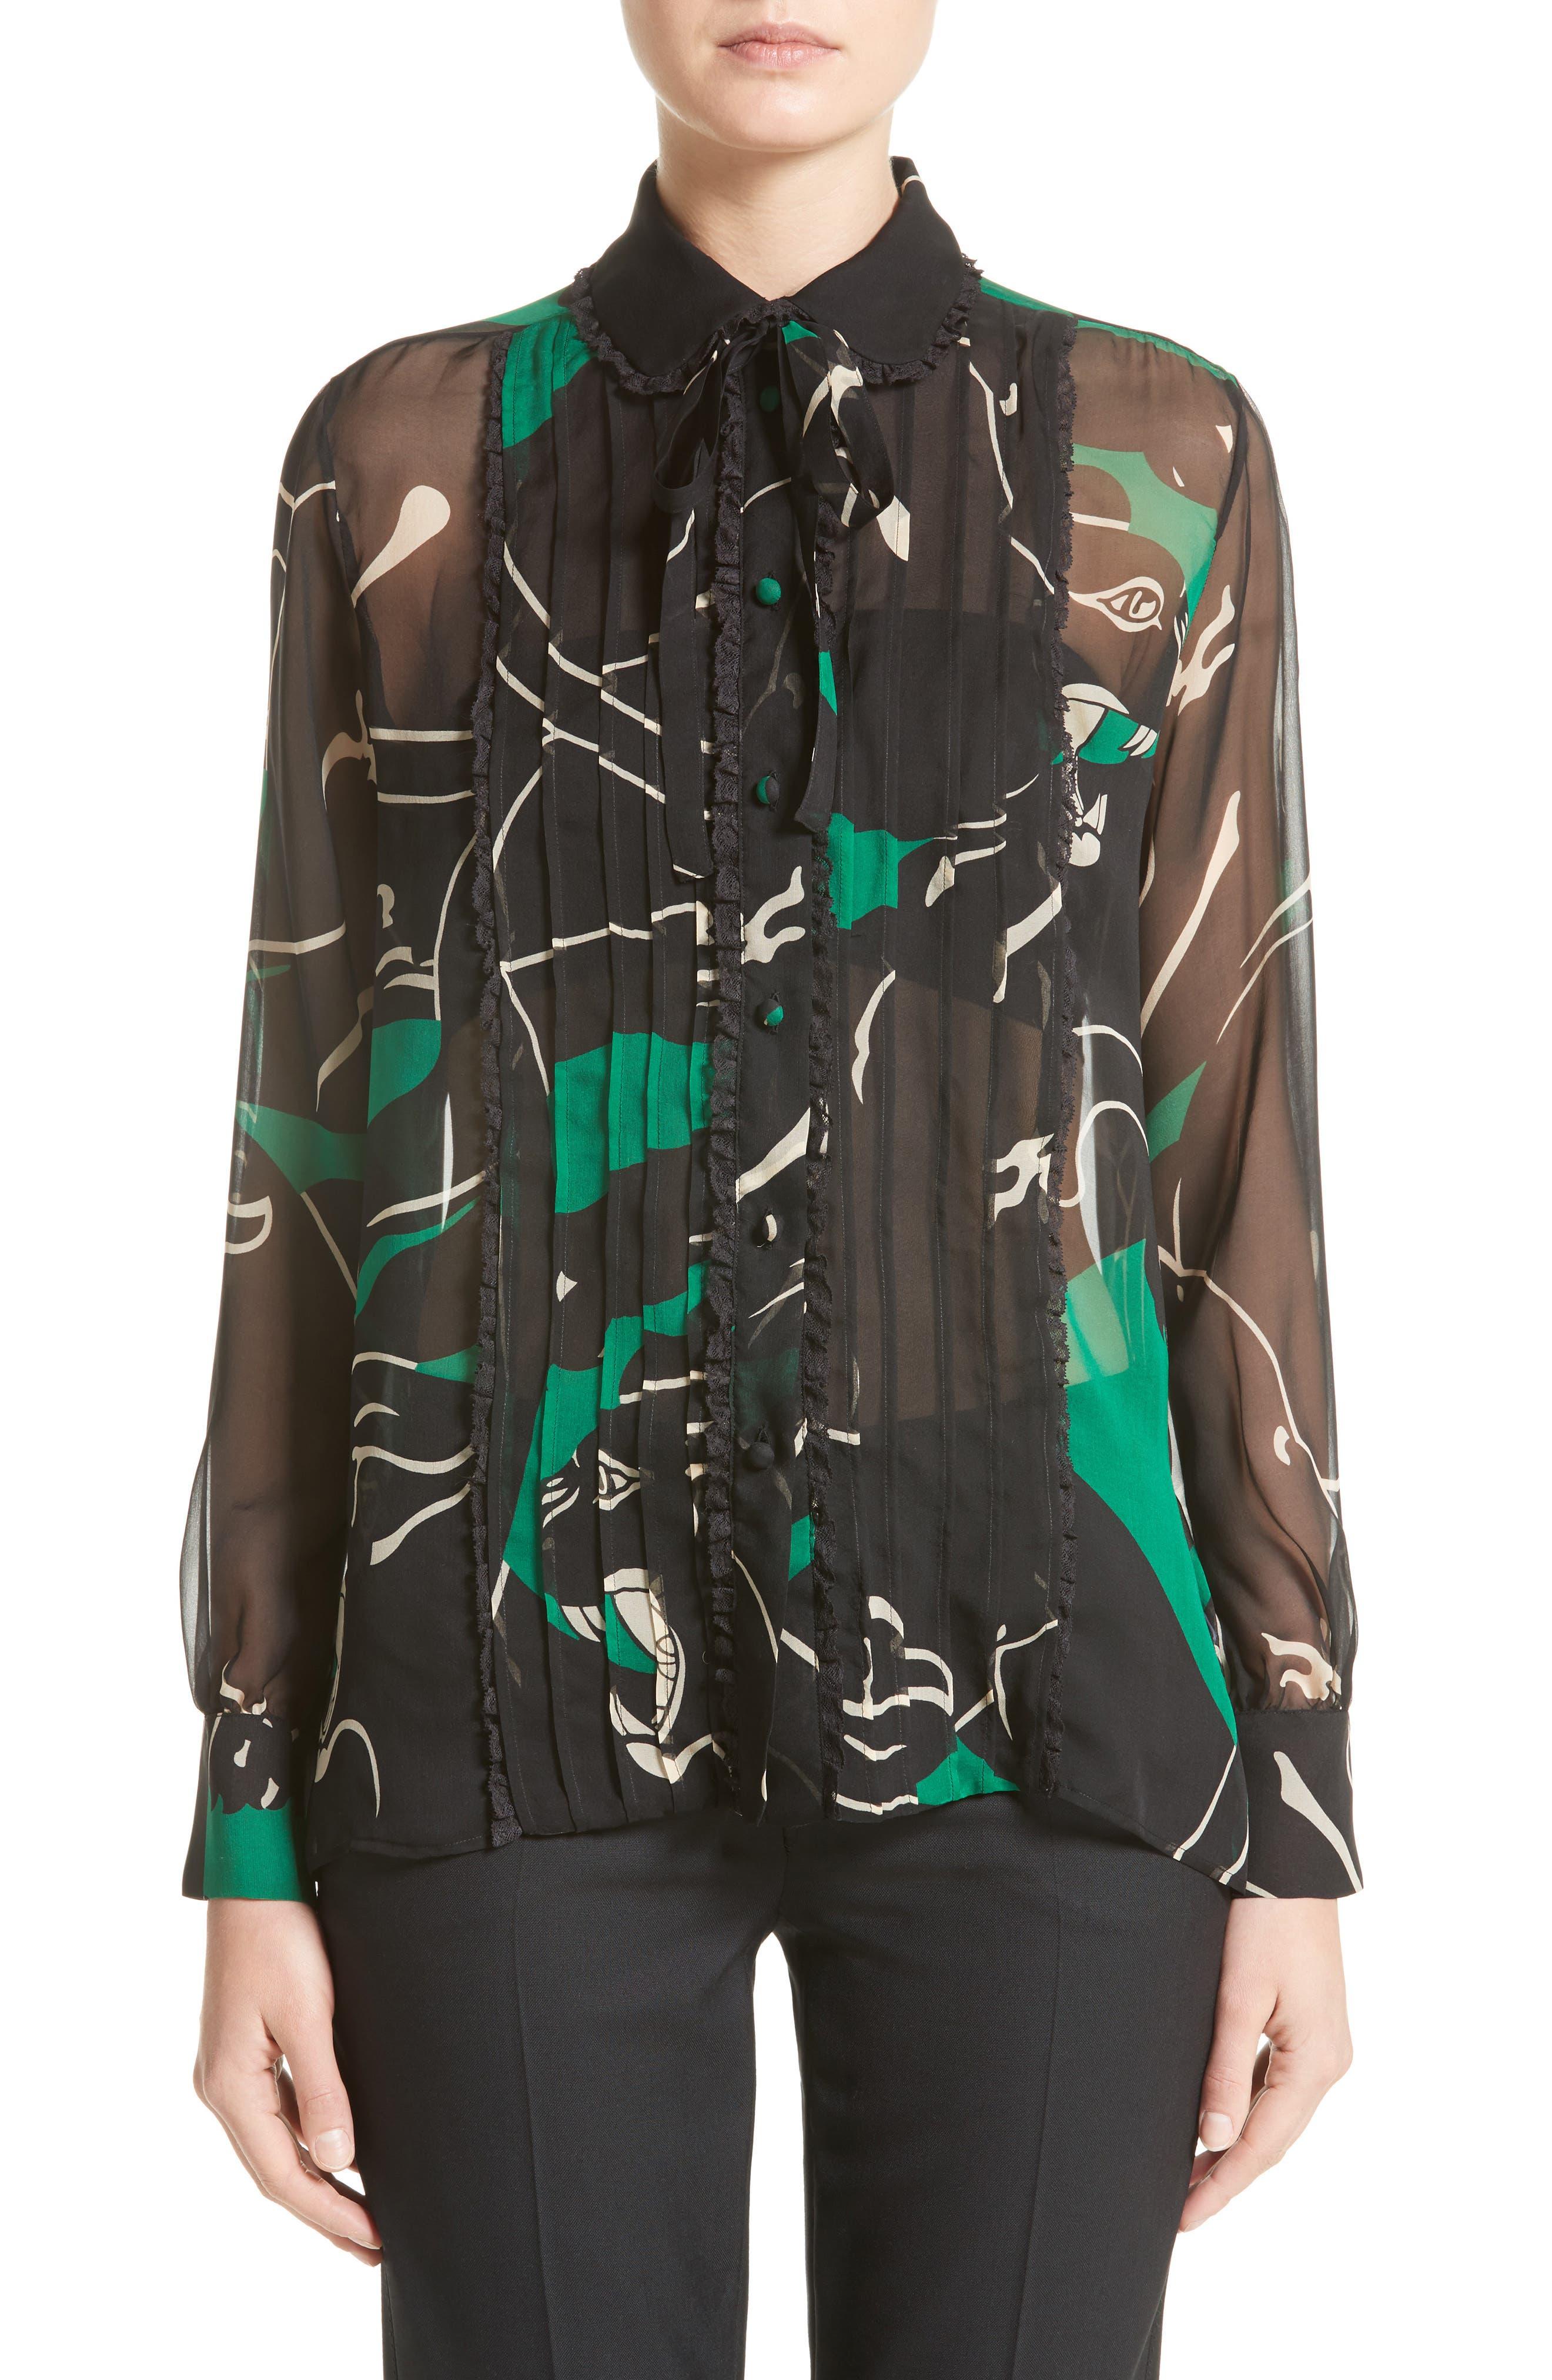 Alternate Image 1 Selected - Valentino Panther Print Silk Chiffon Blouse